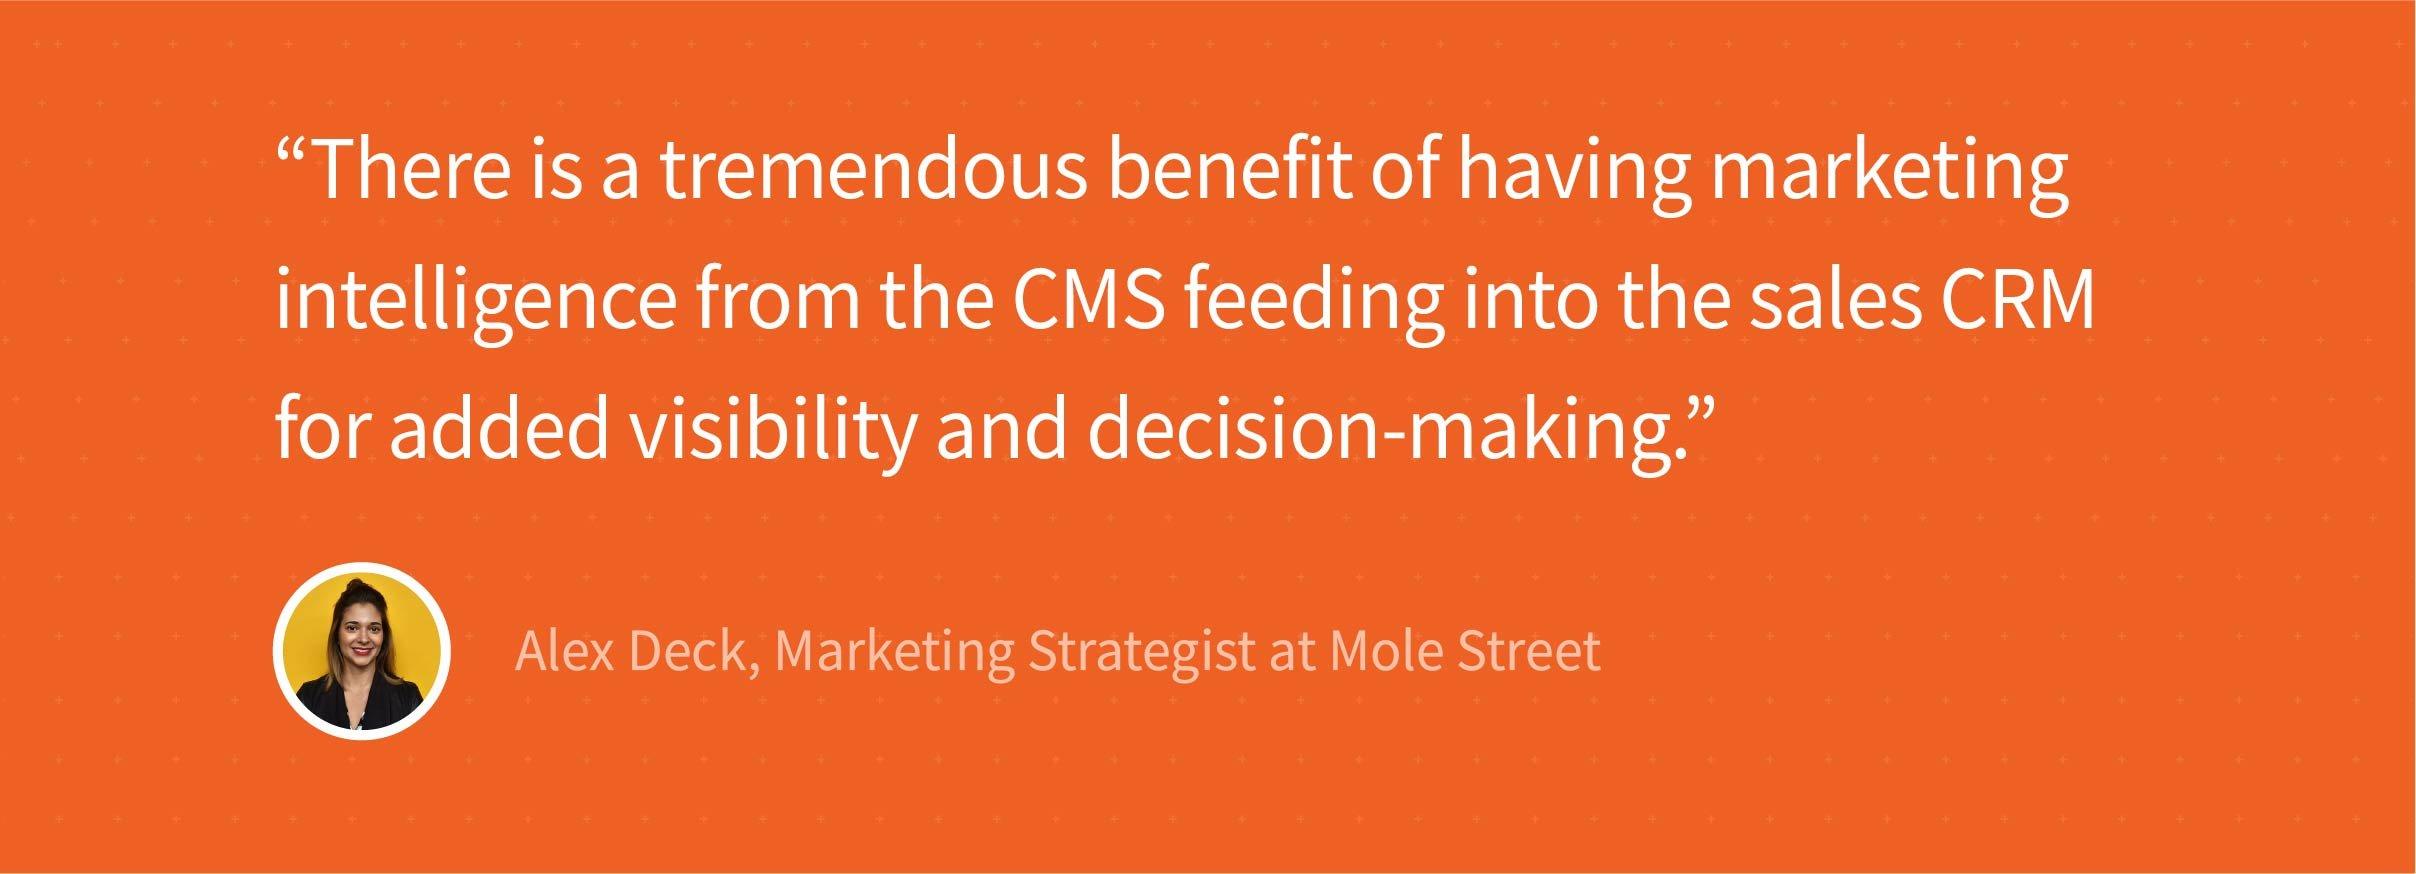 cms-feeding-into-sales-crm